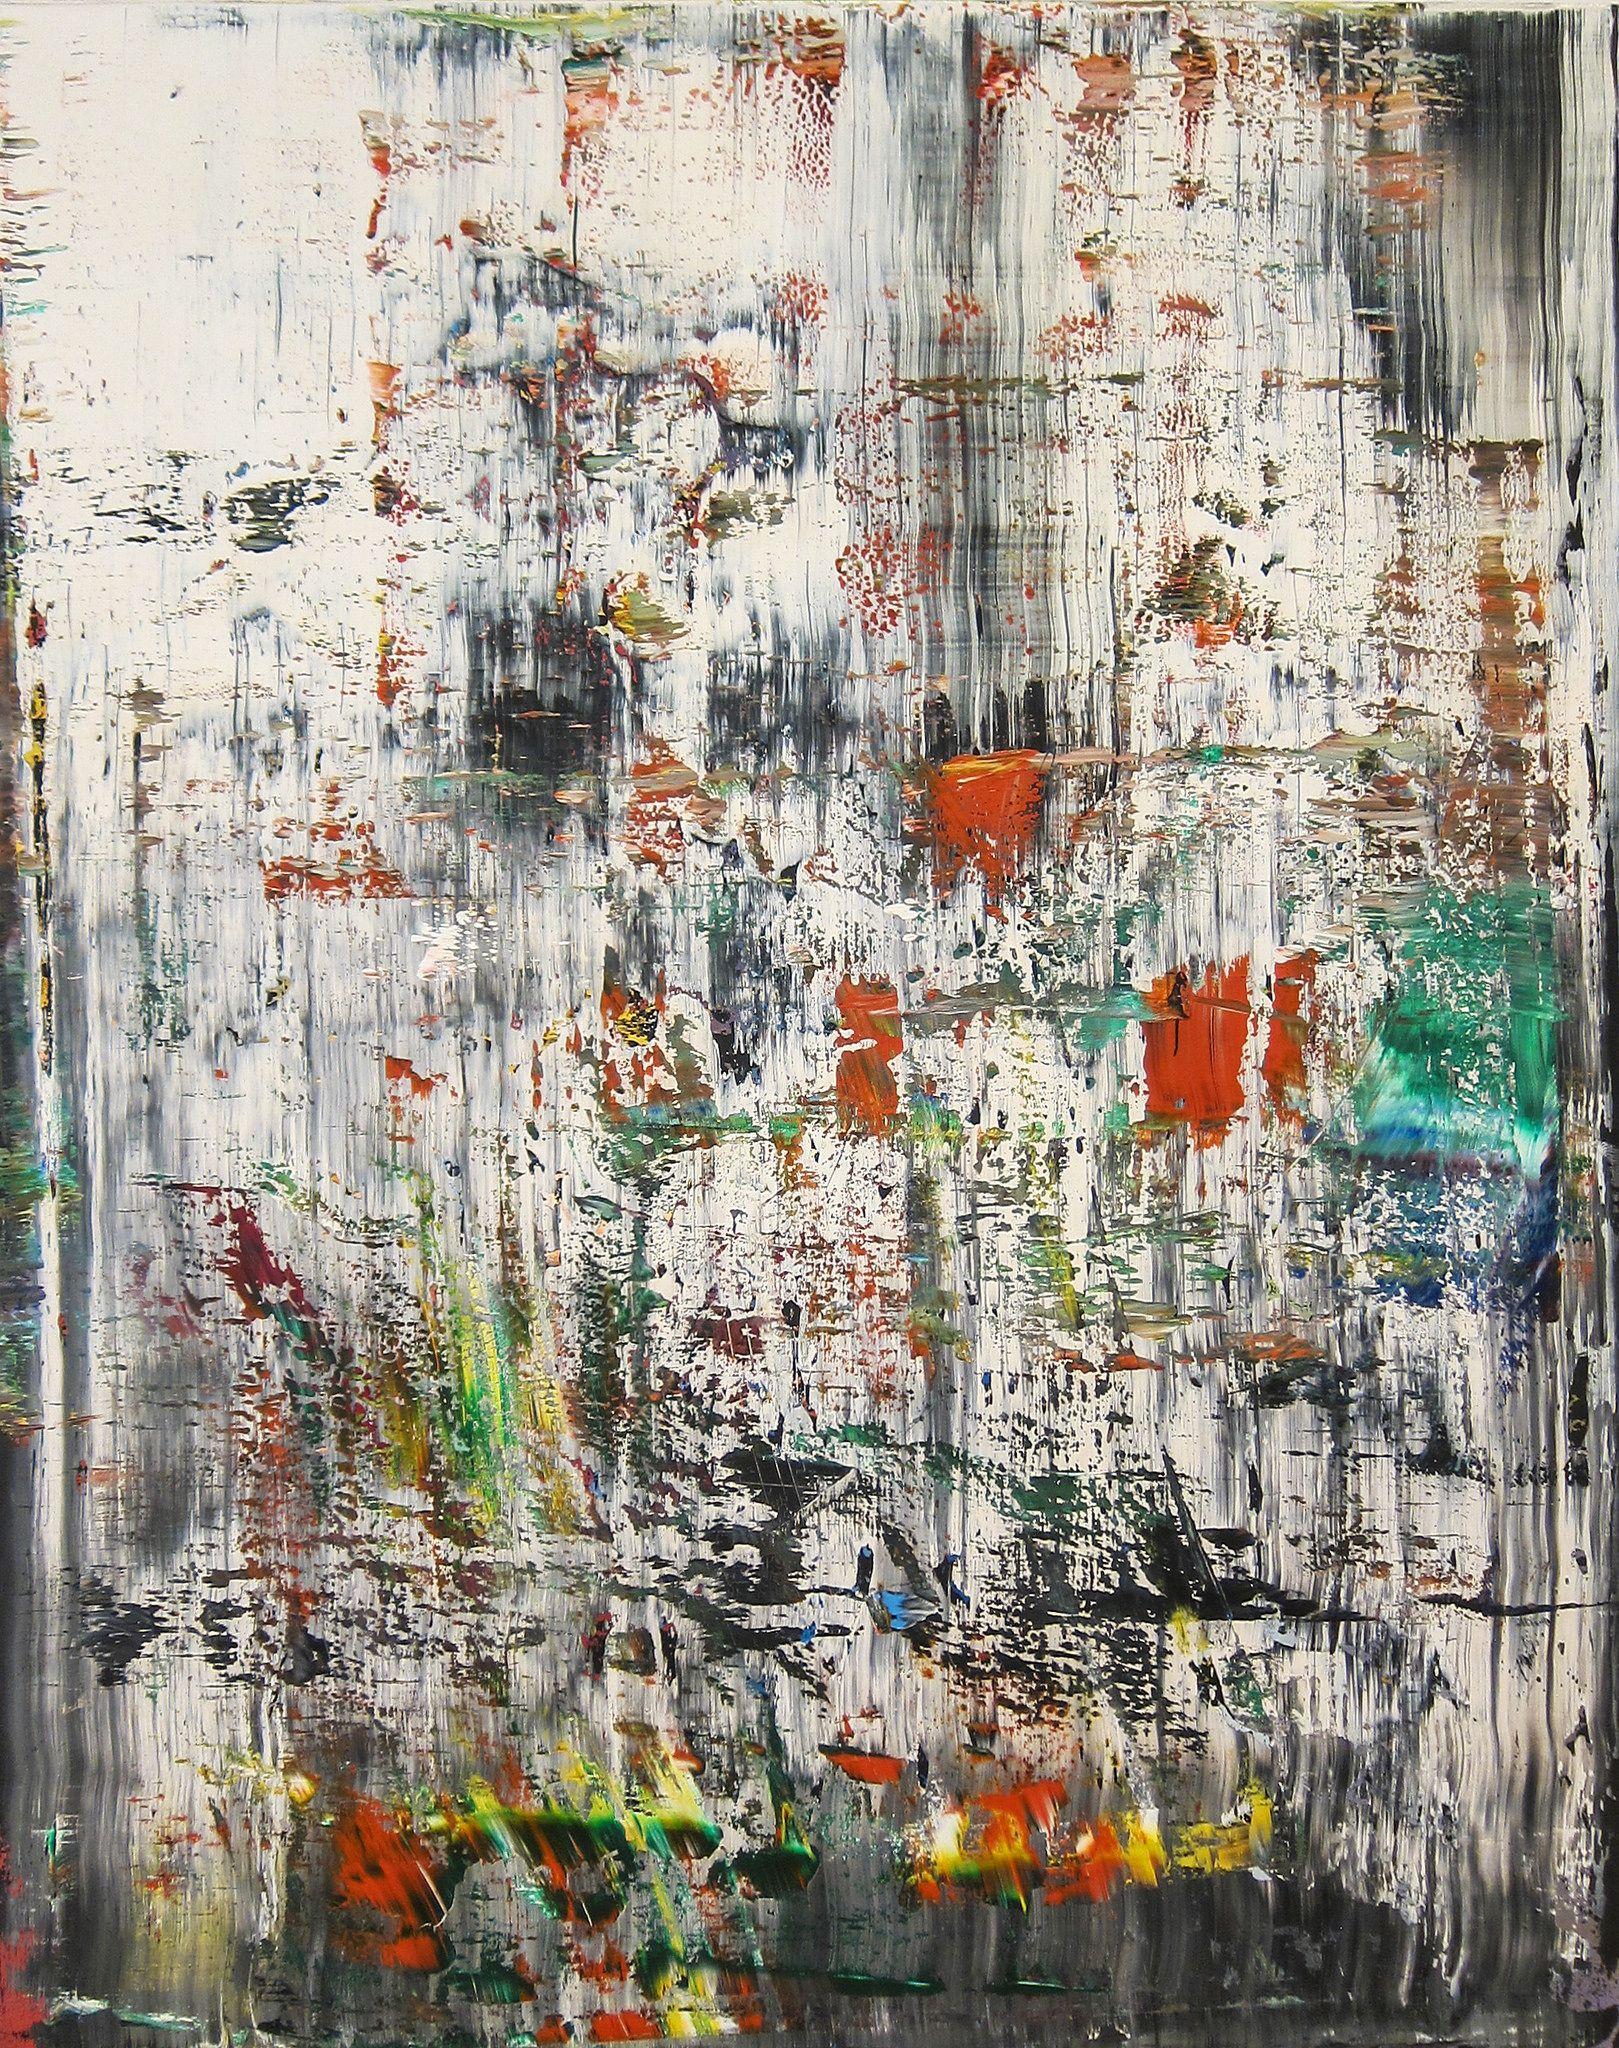 Gerhard Richter Ice Eis 2 1989 In 2019 Museum